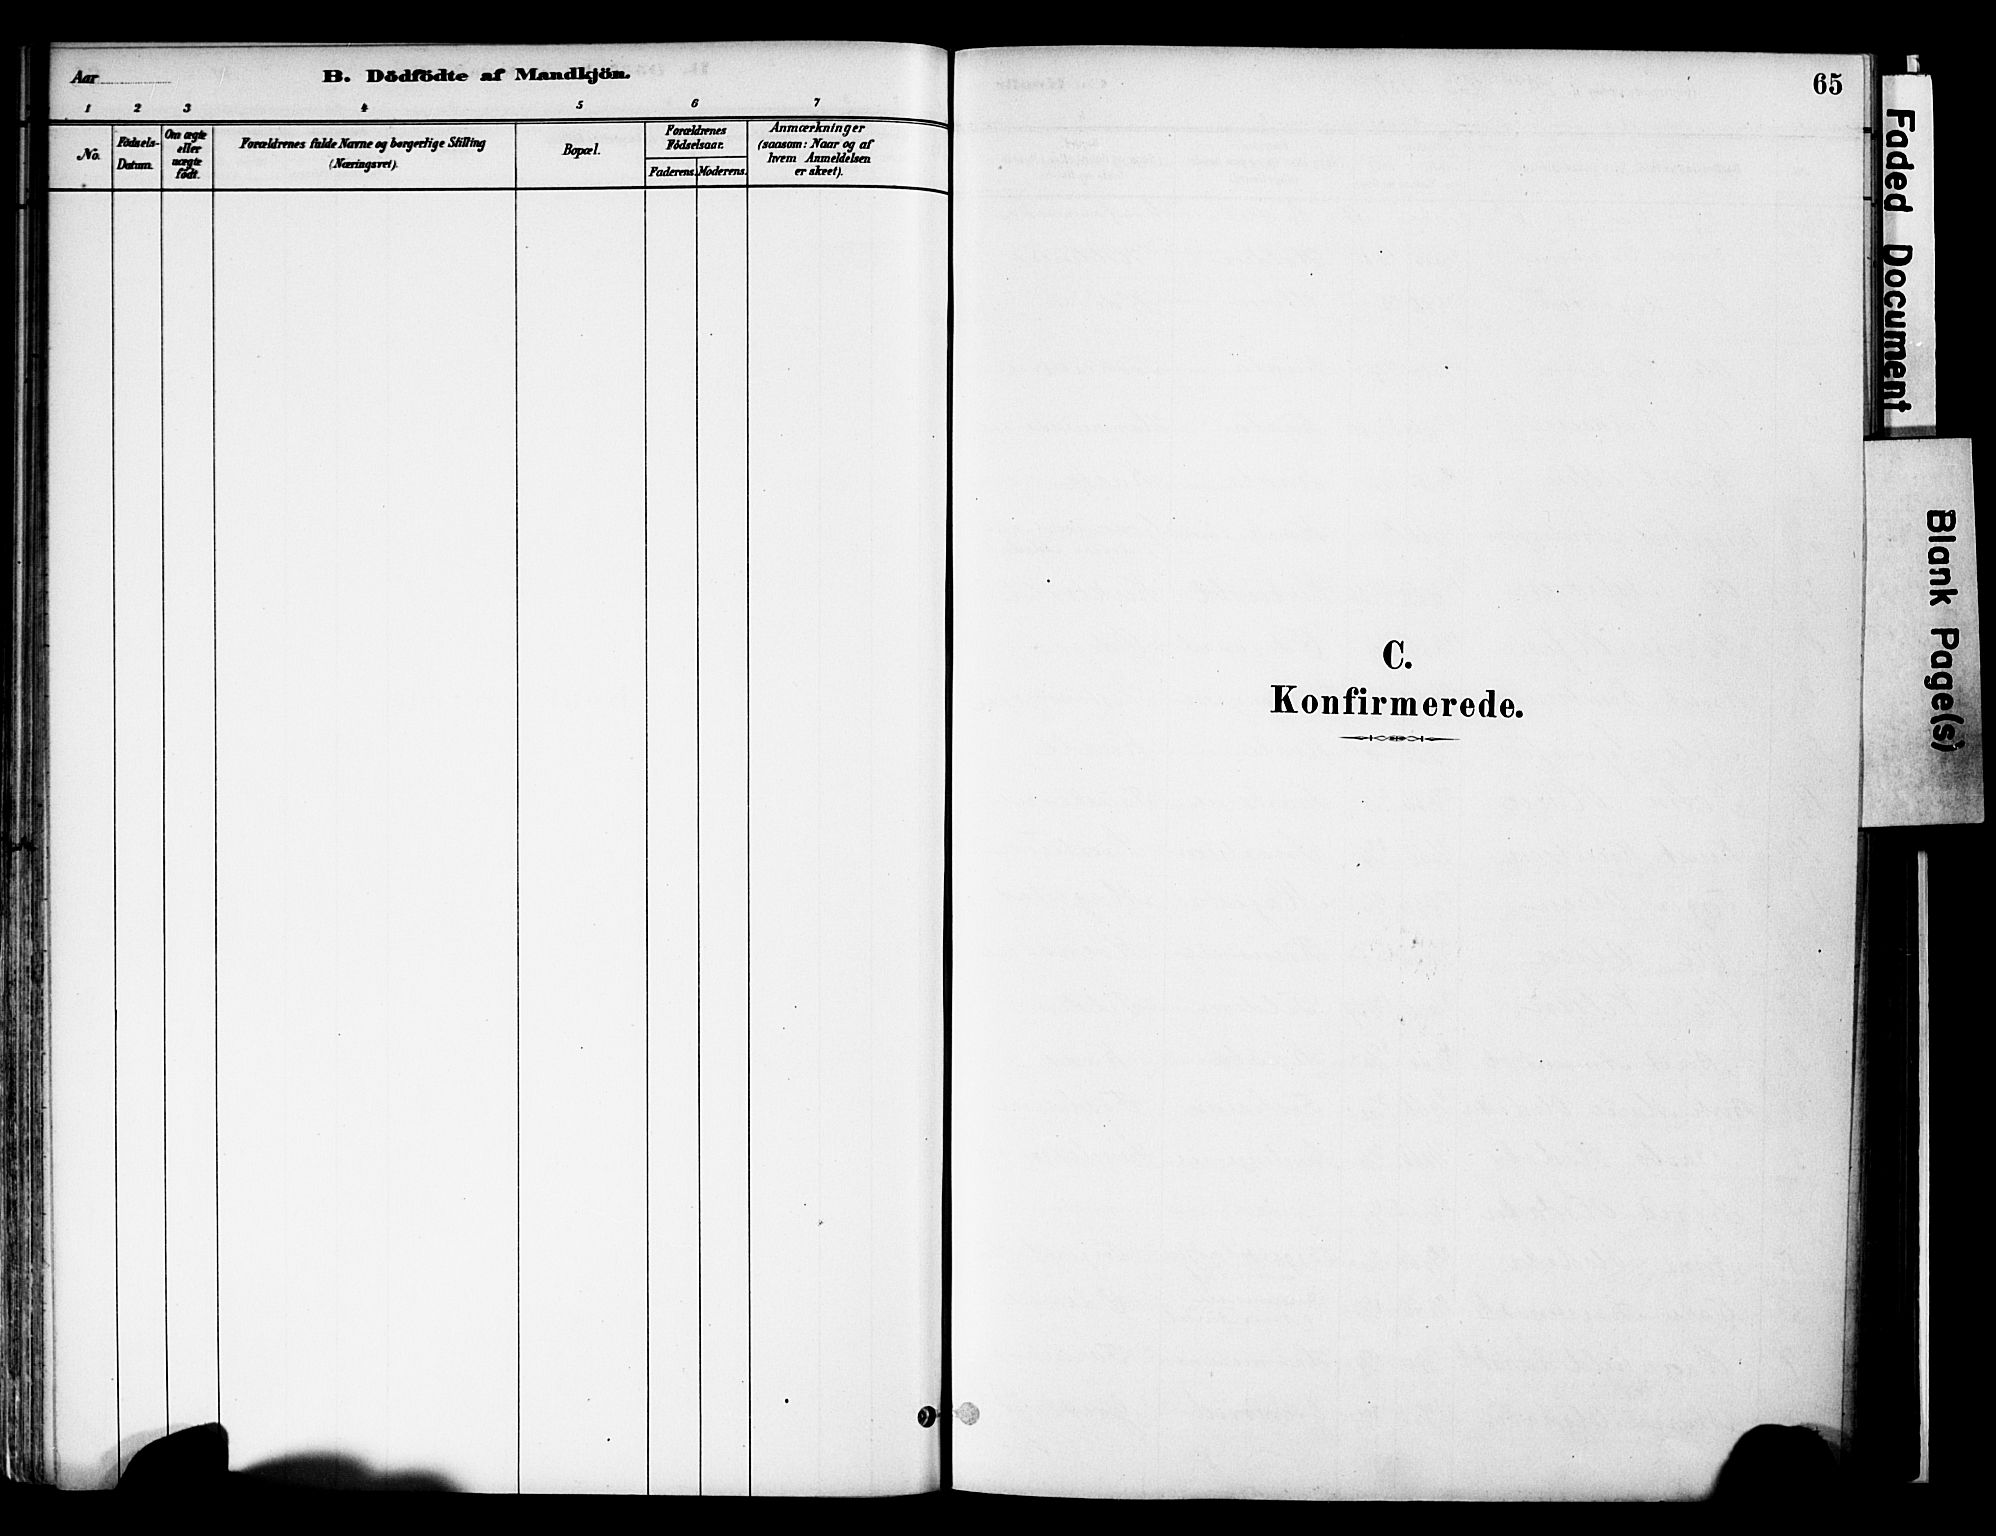 SAH, Vestre Slidre prestekontor, Ministerialbok nr. 6, 1881-1912, s. 65